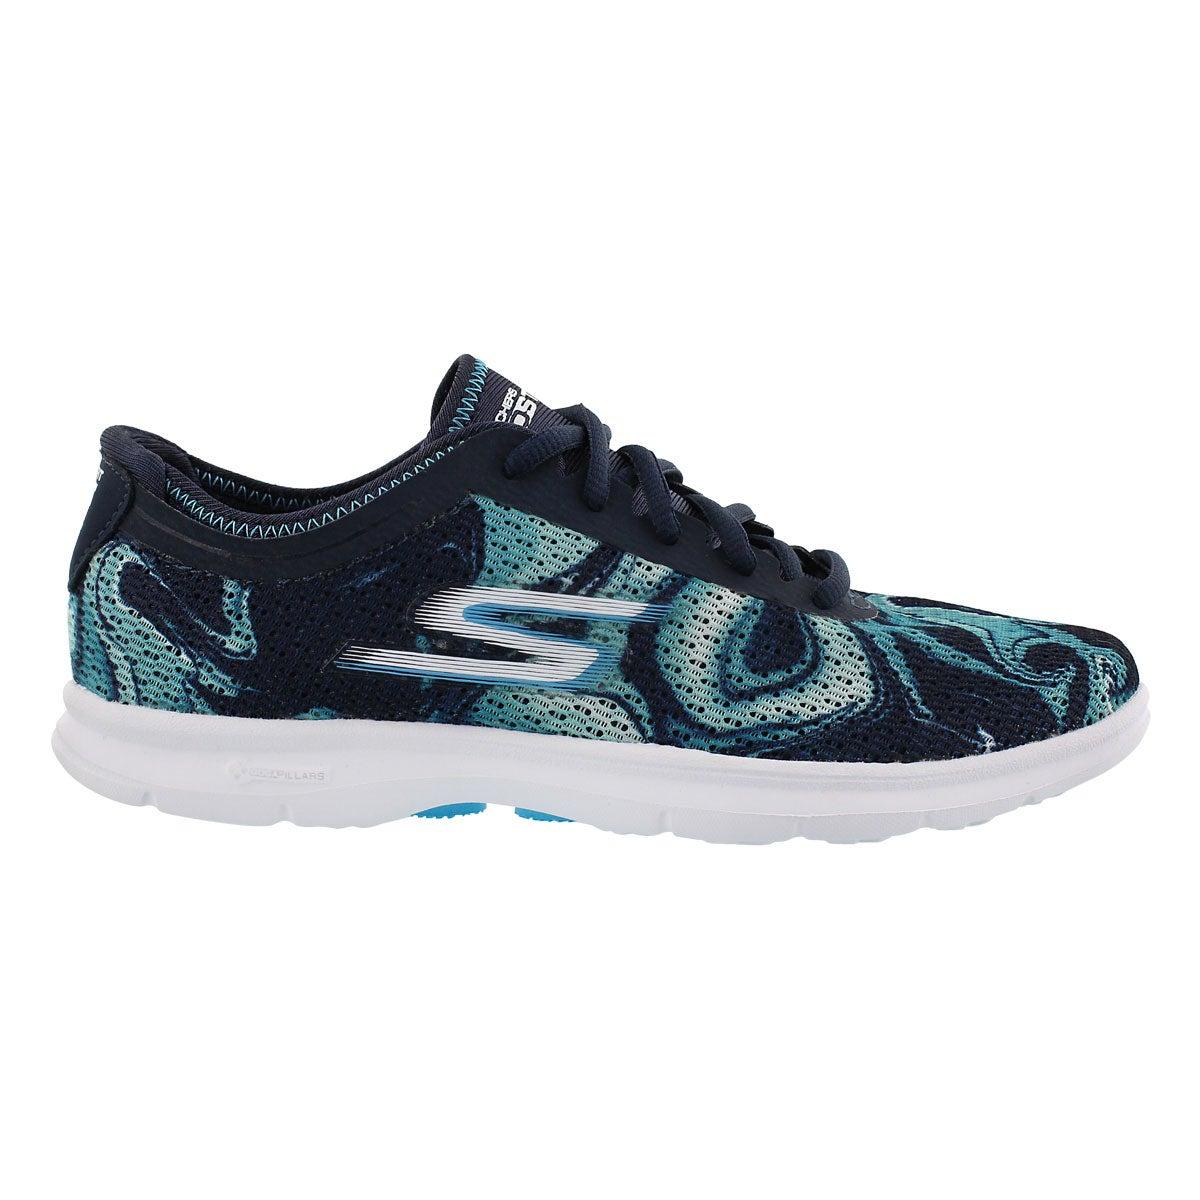 Lds Daze nvy/blu marble print sneaker